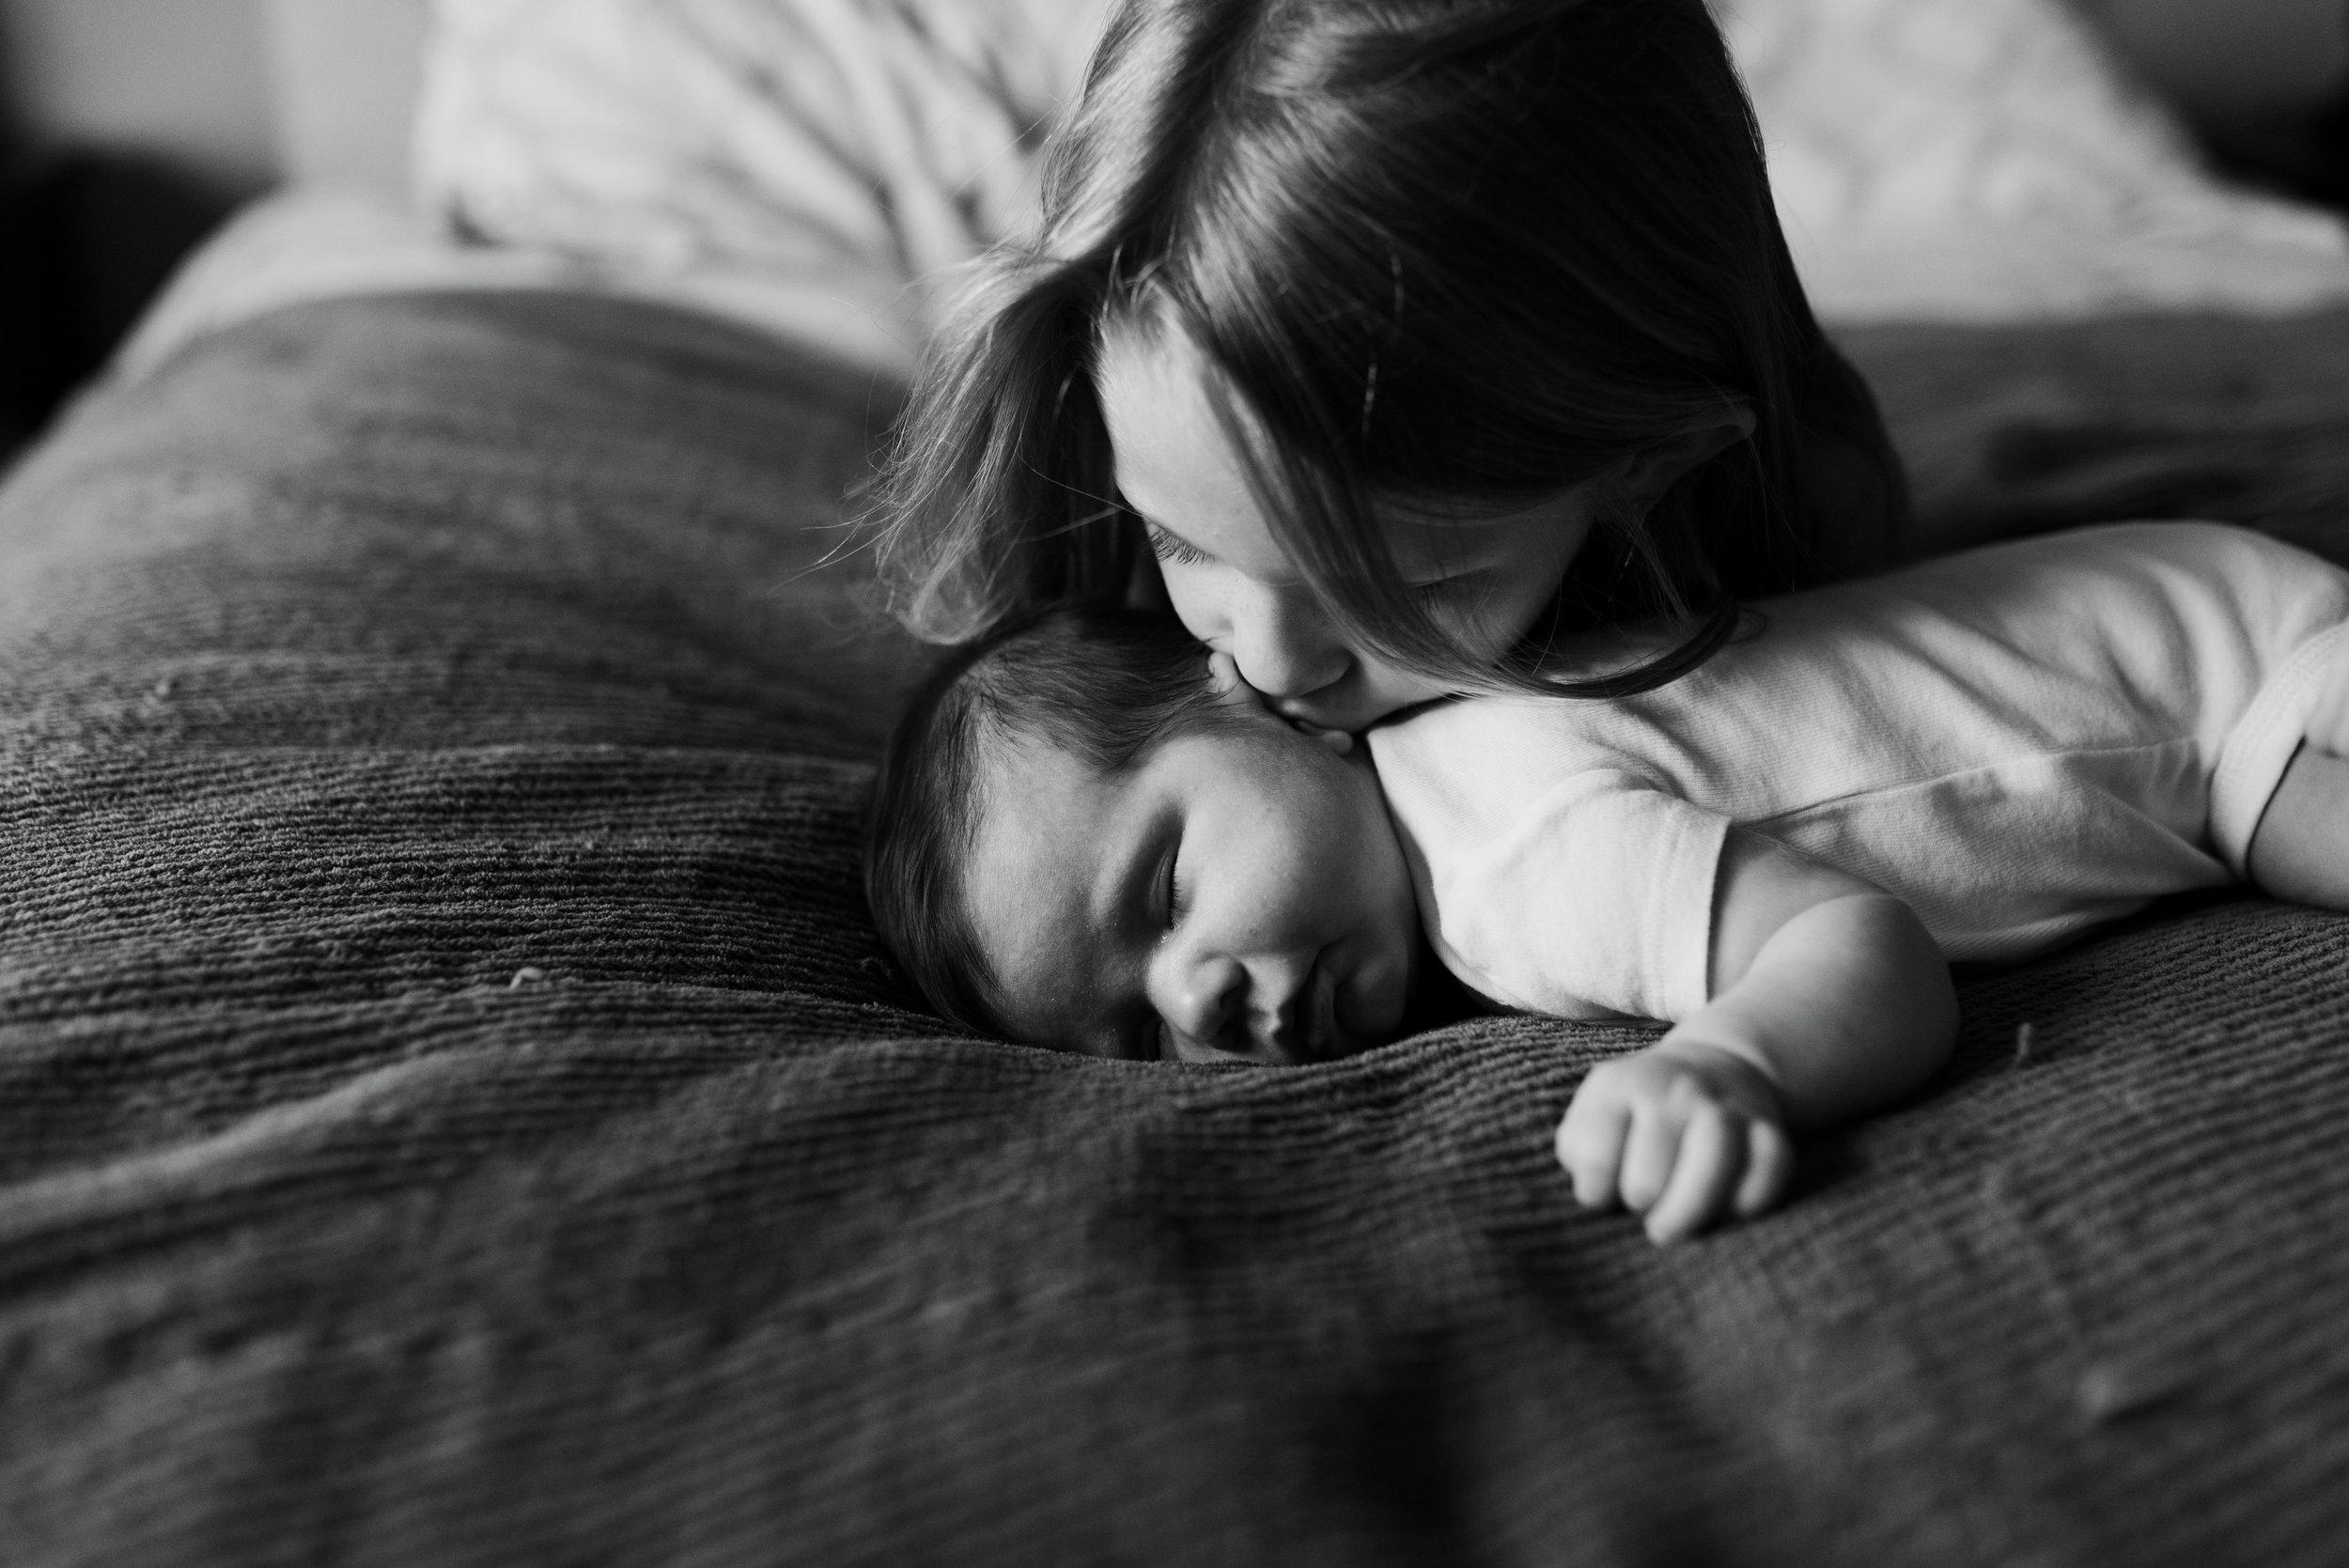 Houston Lifestyle Newborn Session | Houston Natural Light Photographer | www.jordanmitchellphotography.com